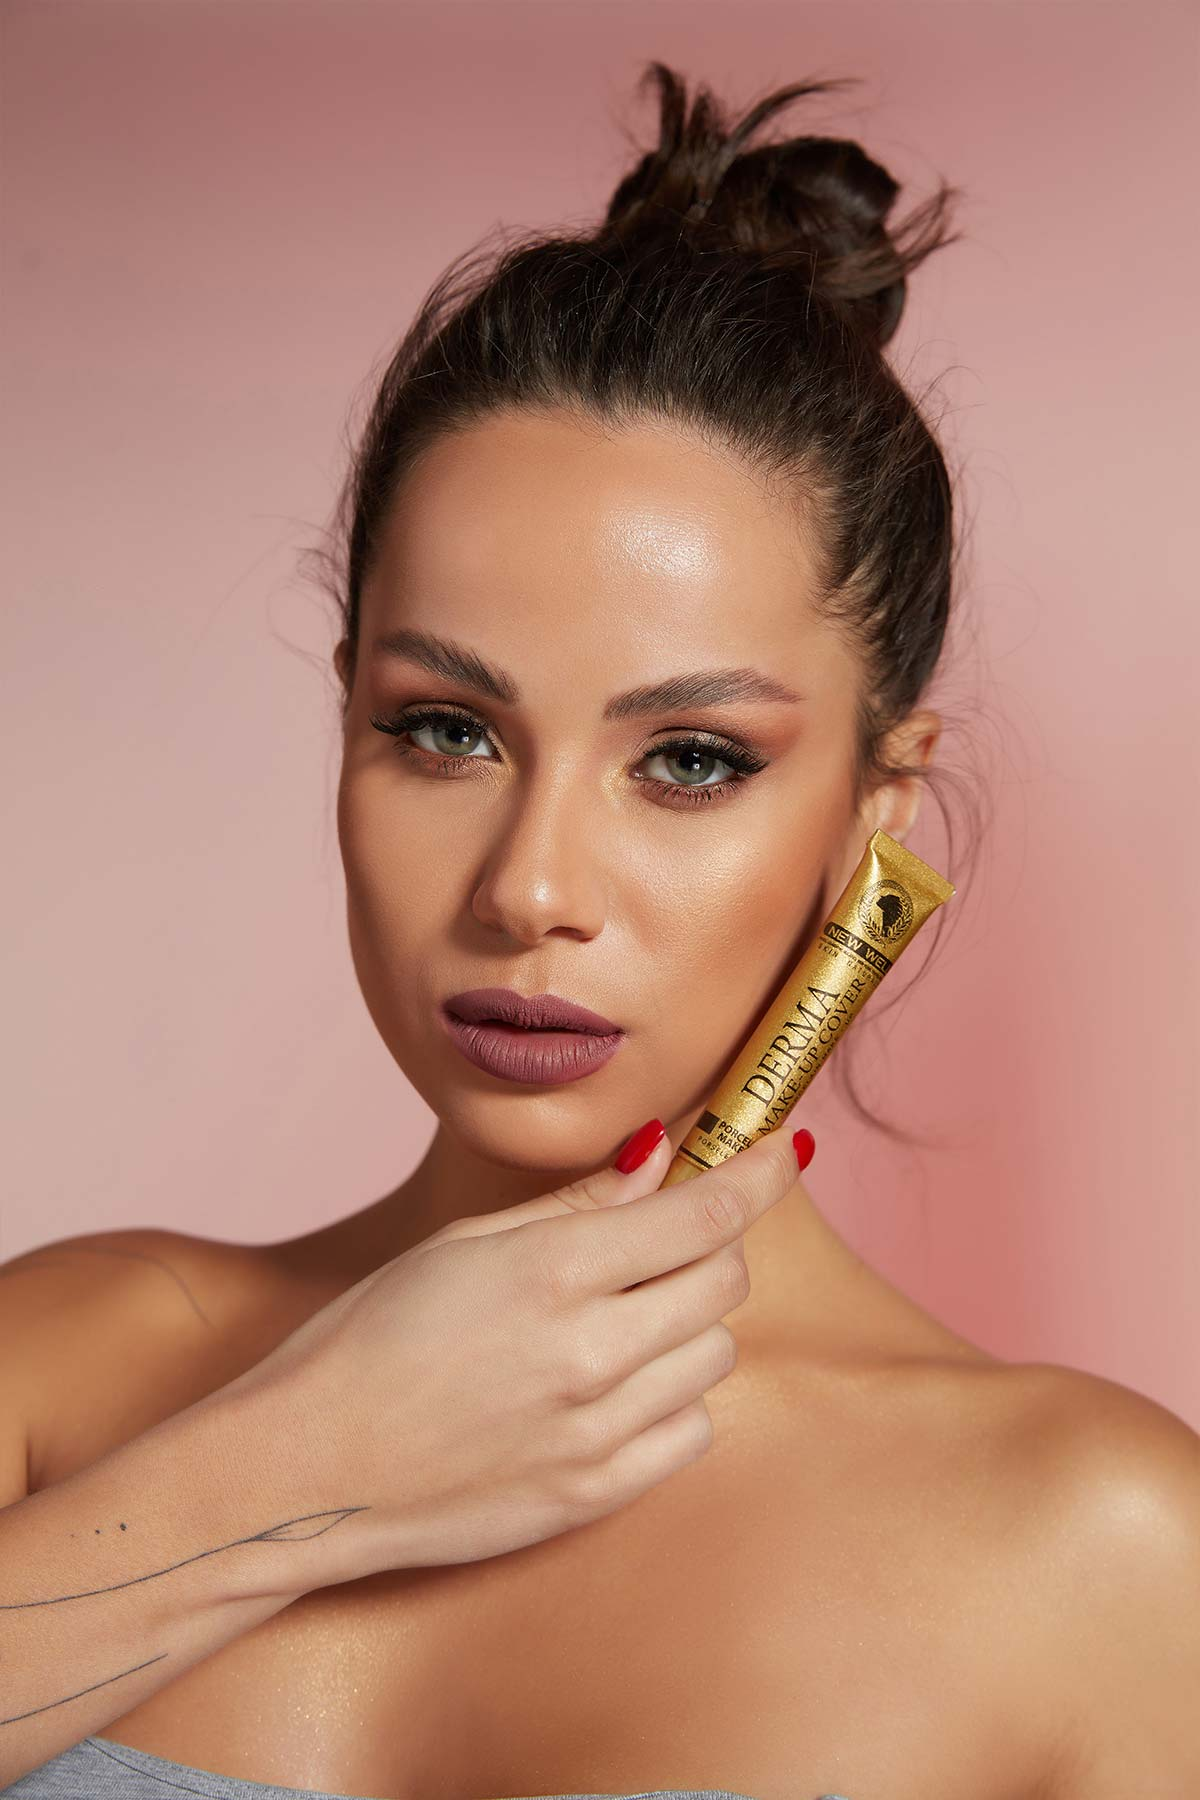 Derma Make-Up Cover Foundation - Bronze -Fondöten - Foundation